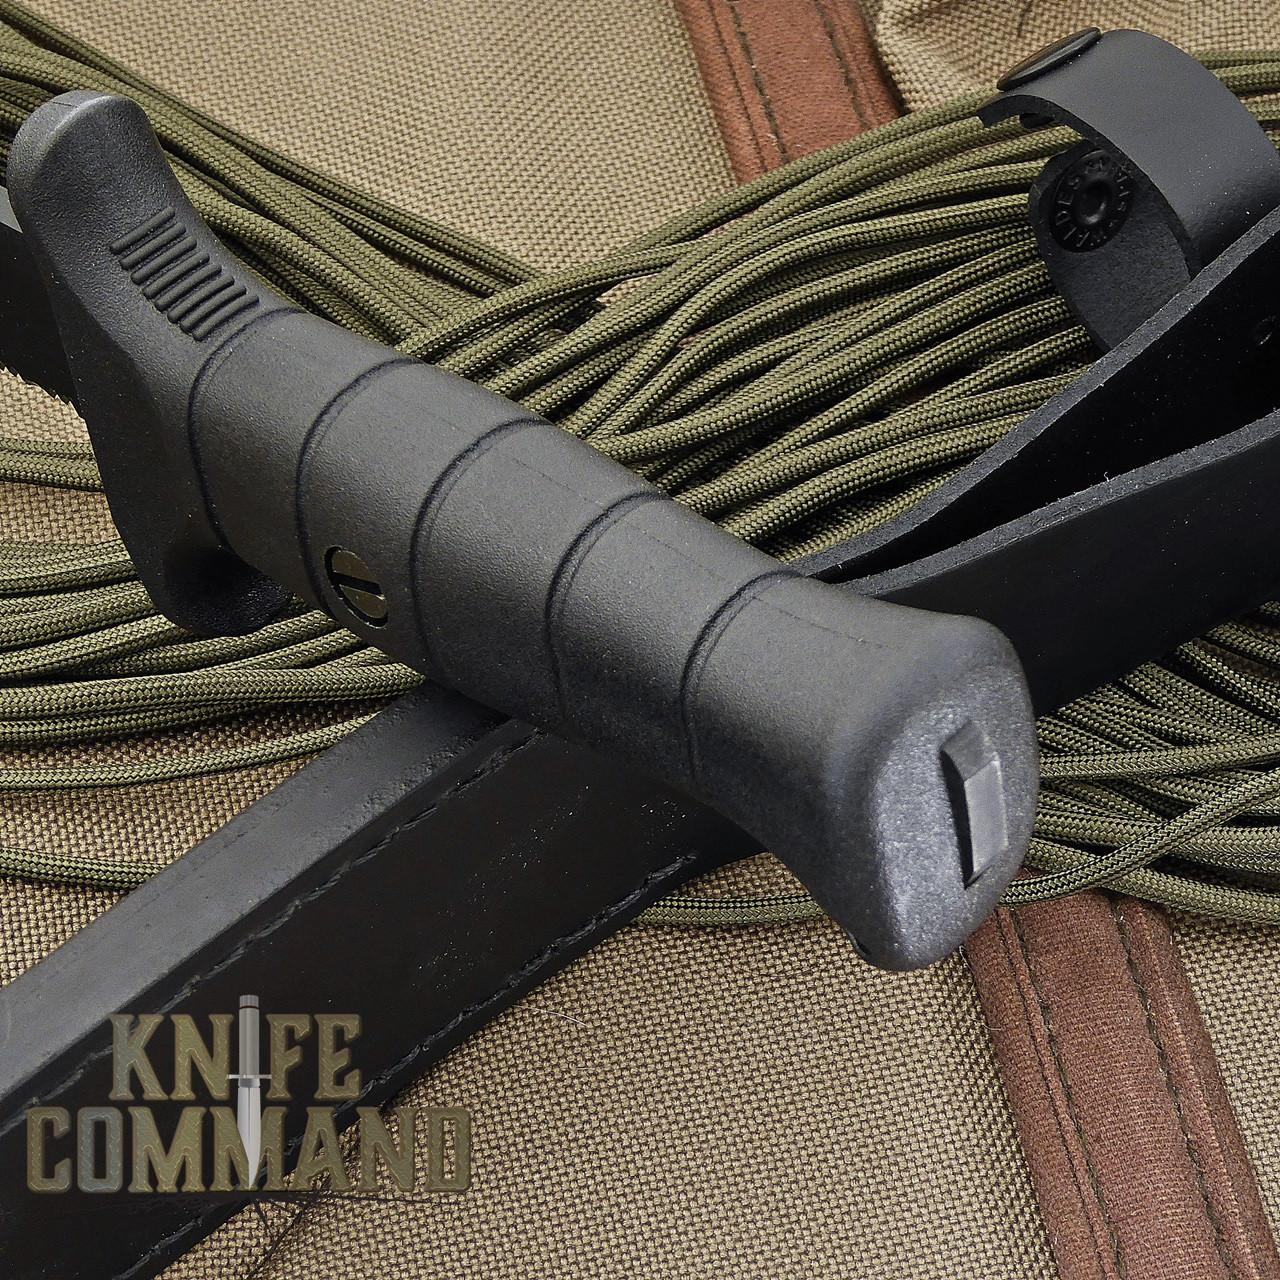 Eickhorn Solingen Wolverine German Expedition Knife.  Mil spec handle with glass breaker.